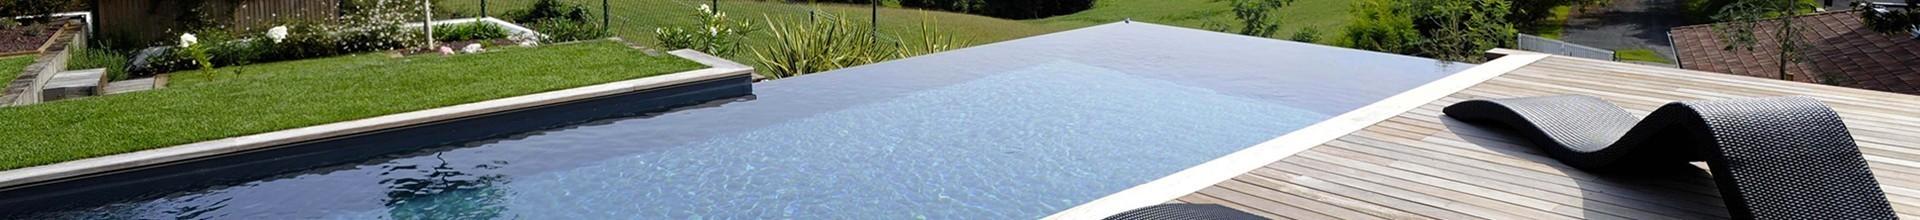 Tarn Occitanie nettoyage d'une piscine en béton, robuste, durable